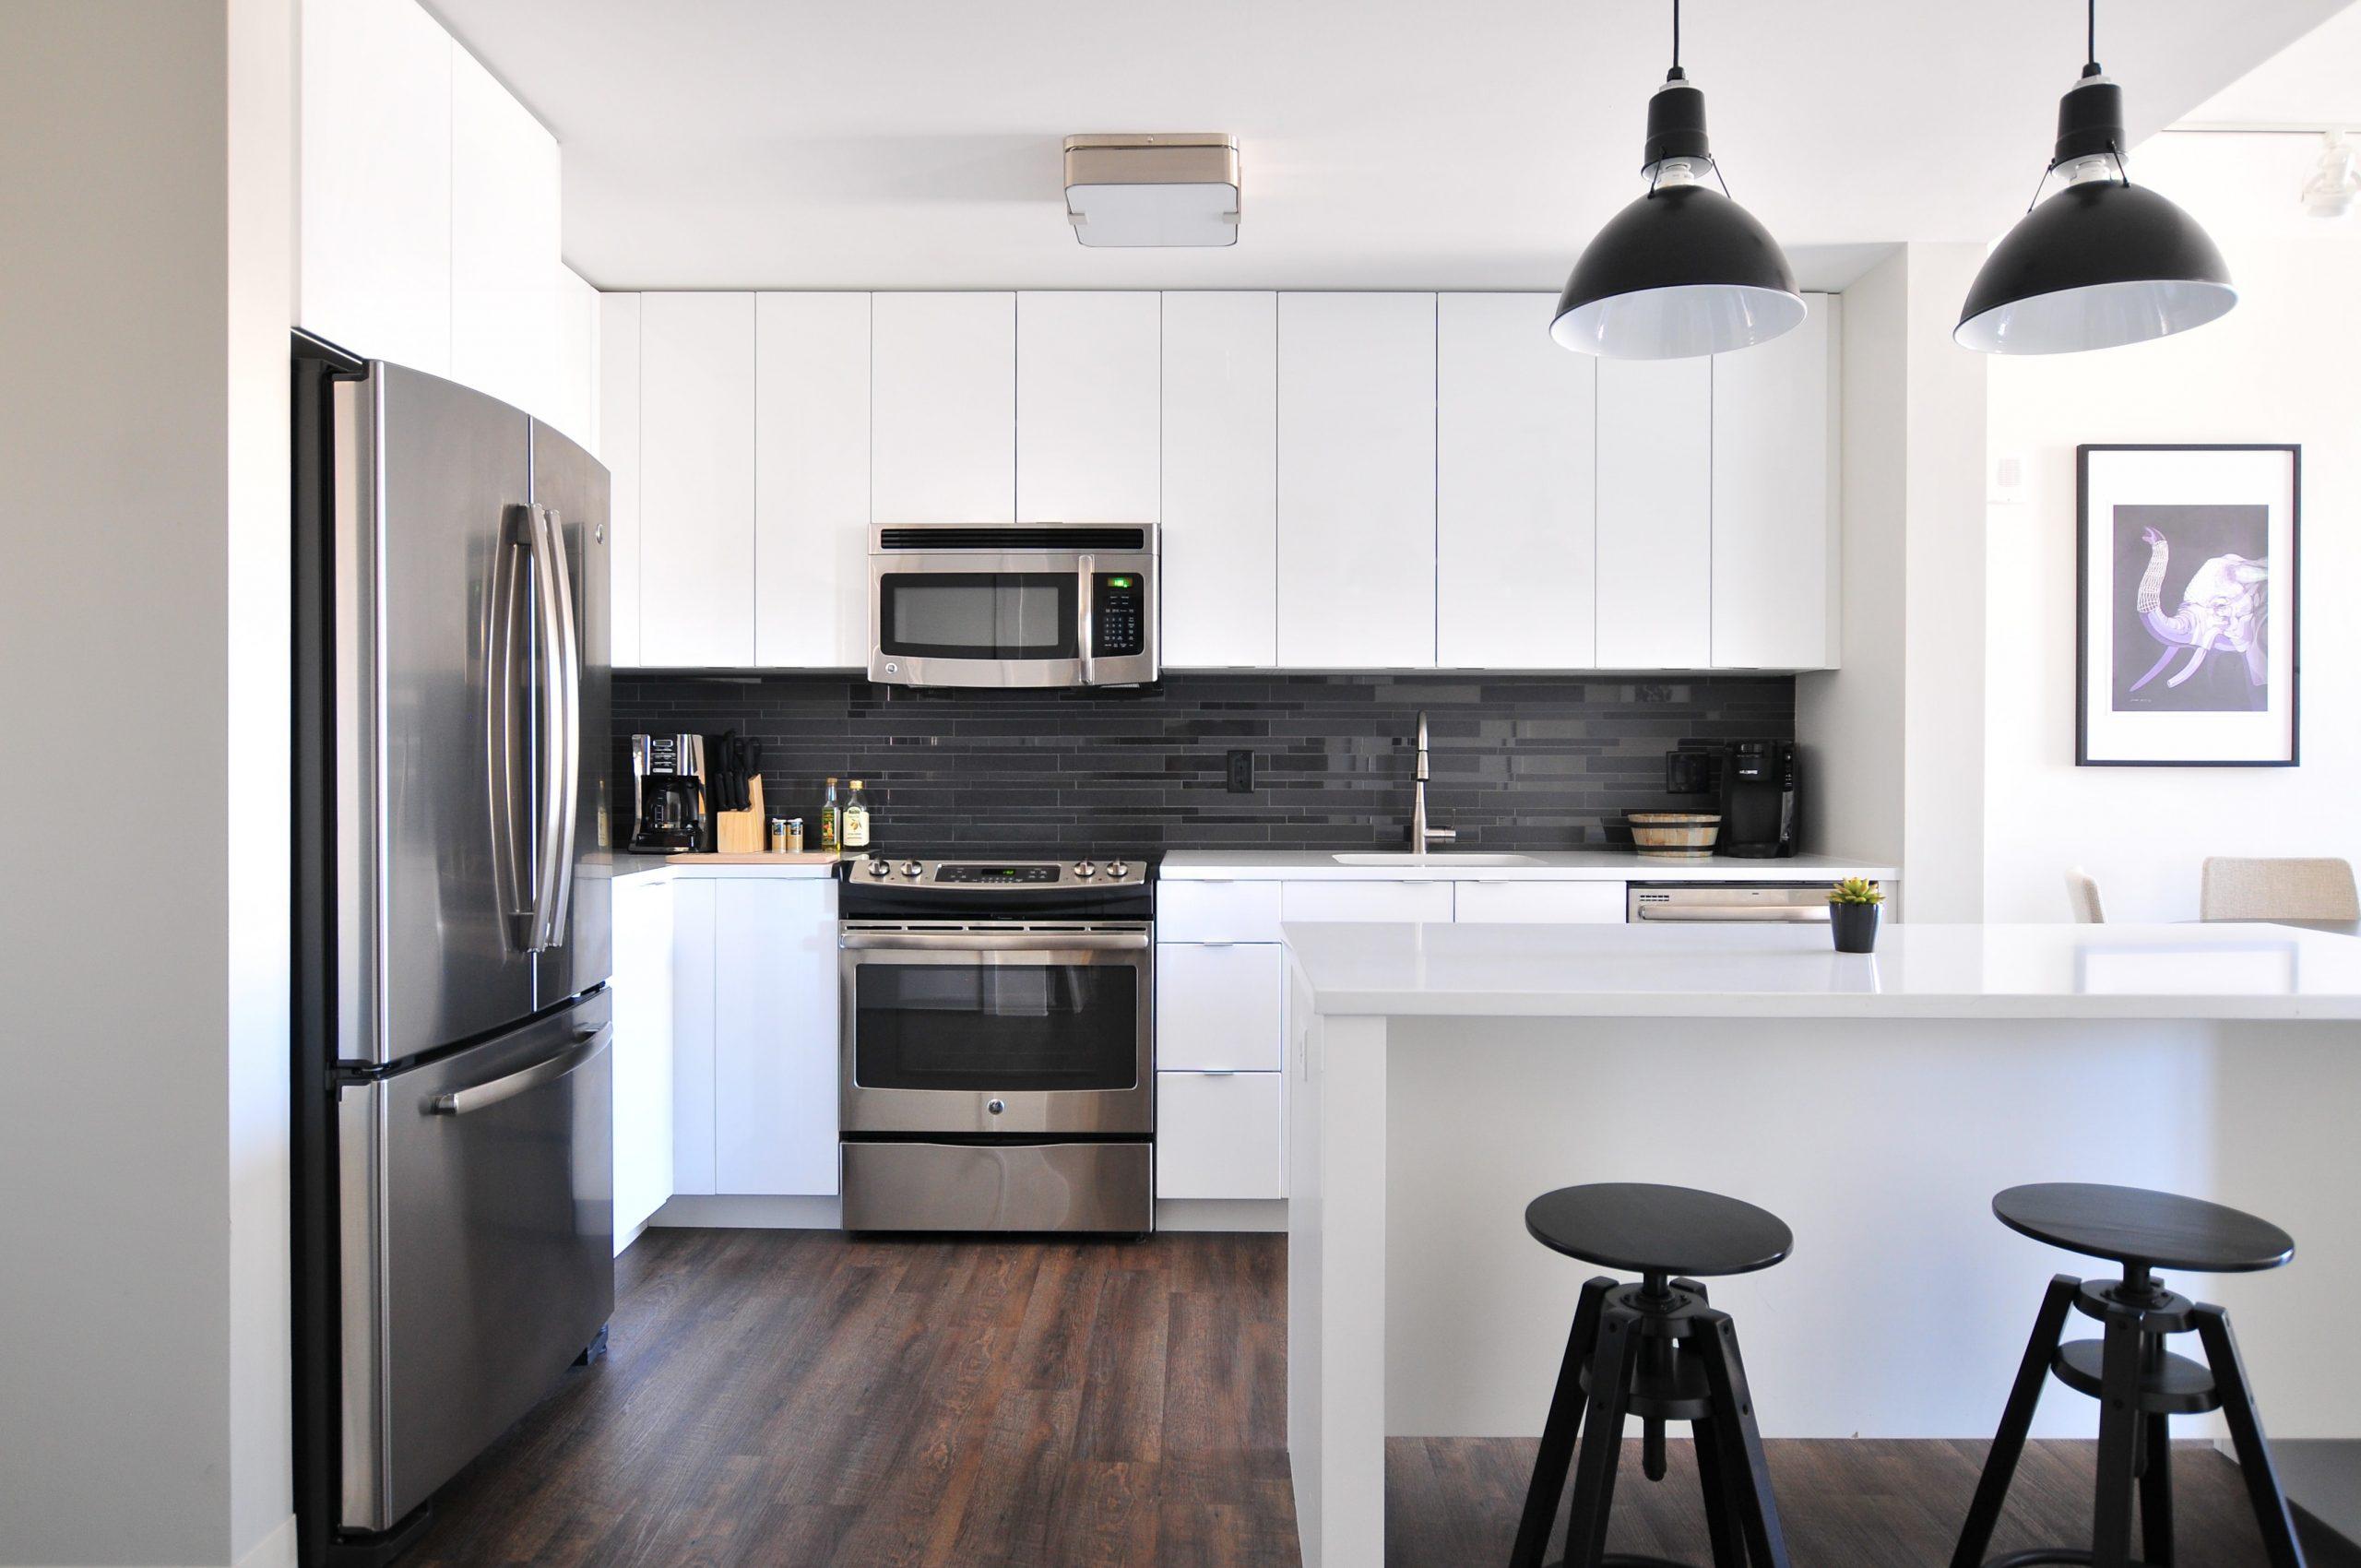 fridge space